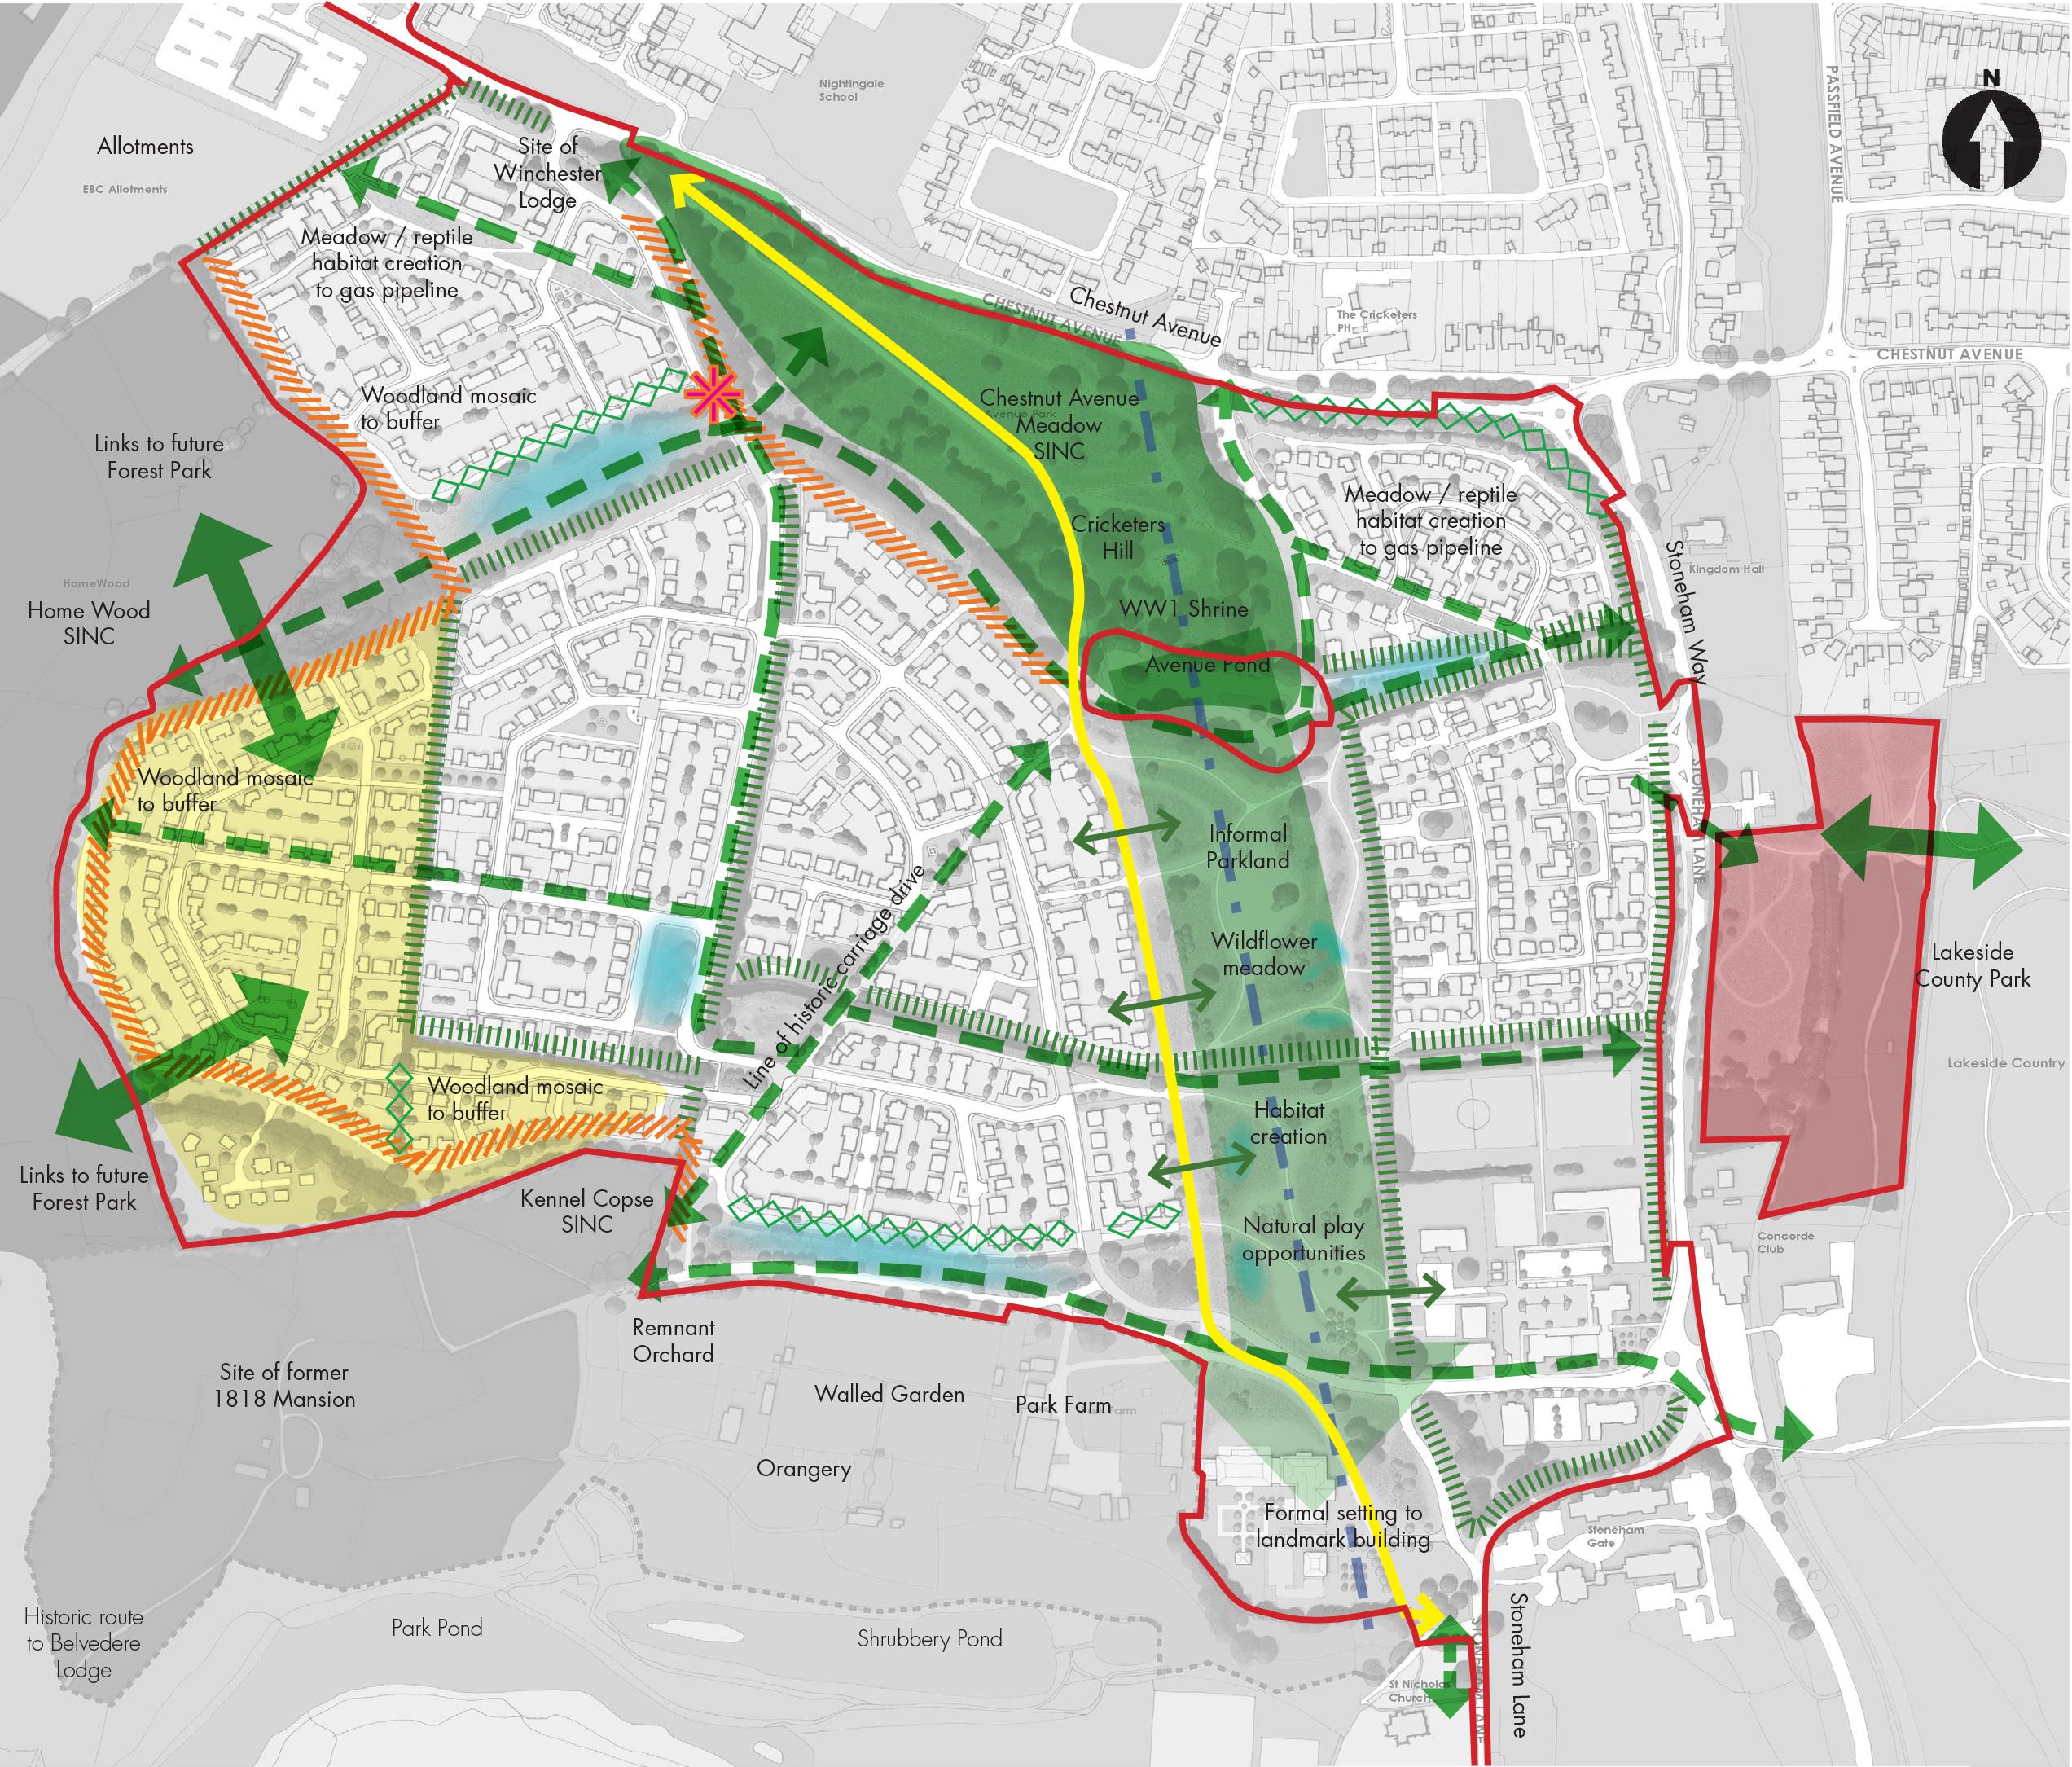 North Stoneham Park: creative conservation - Influence